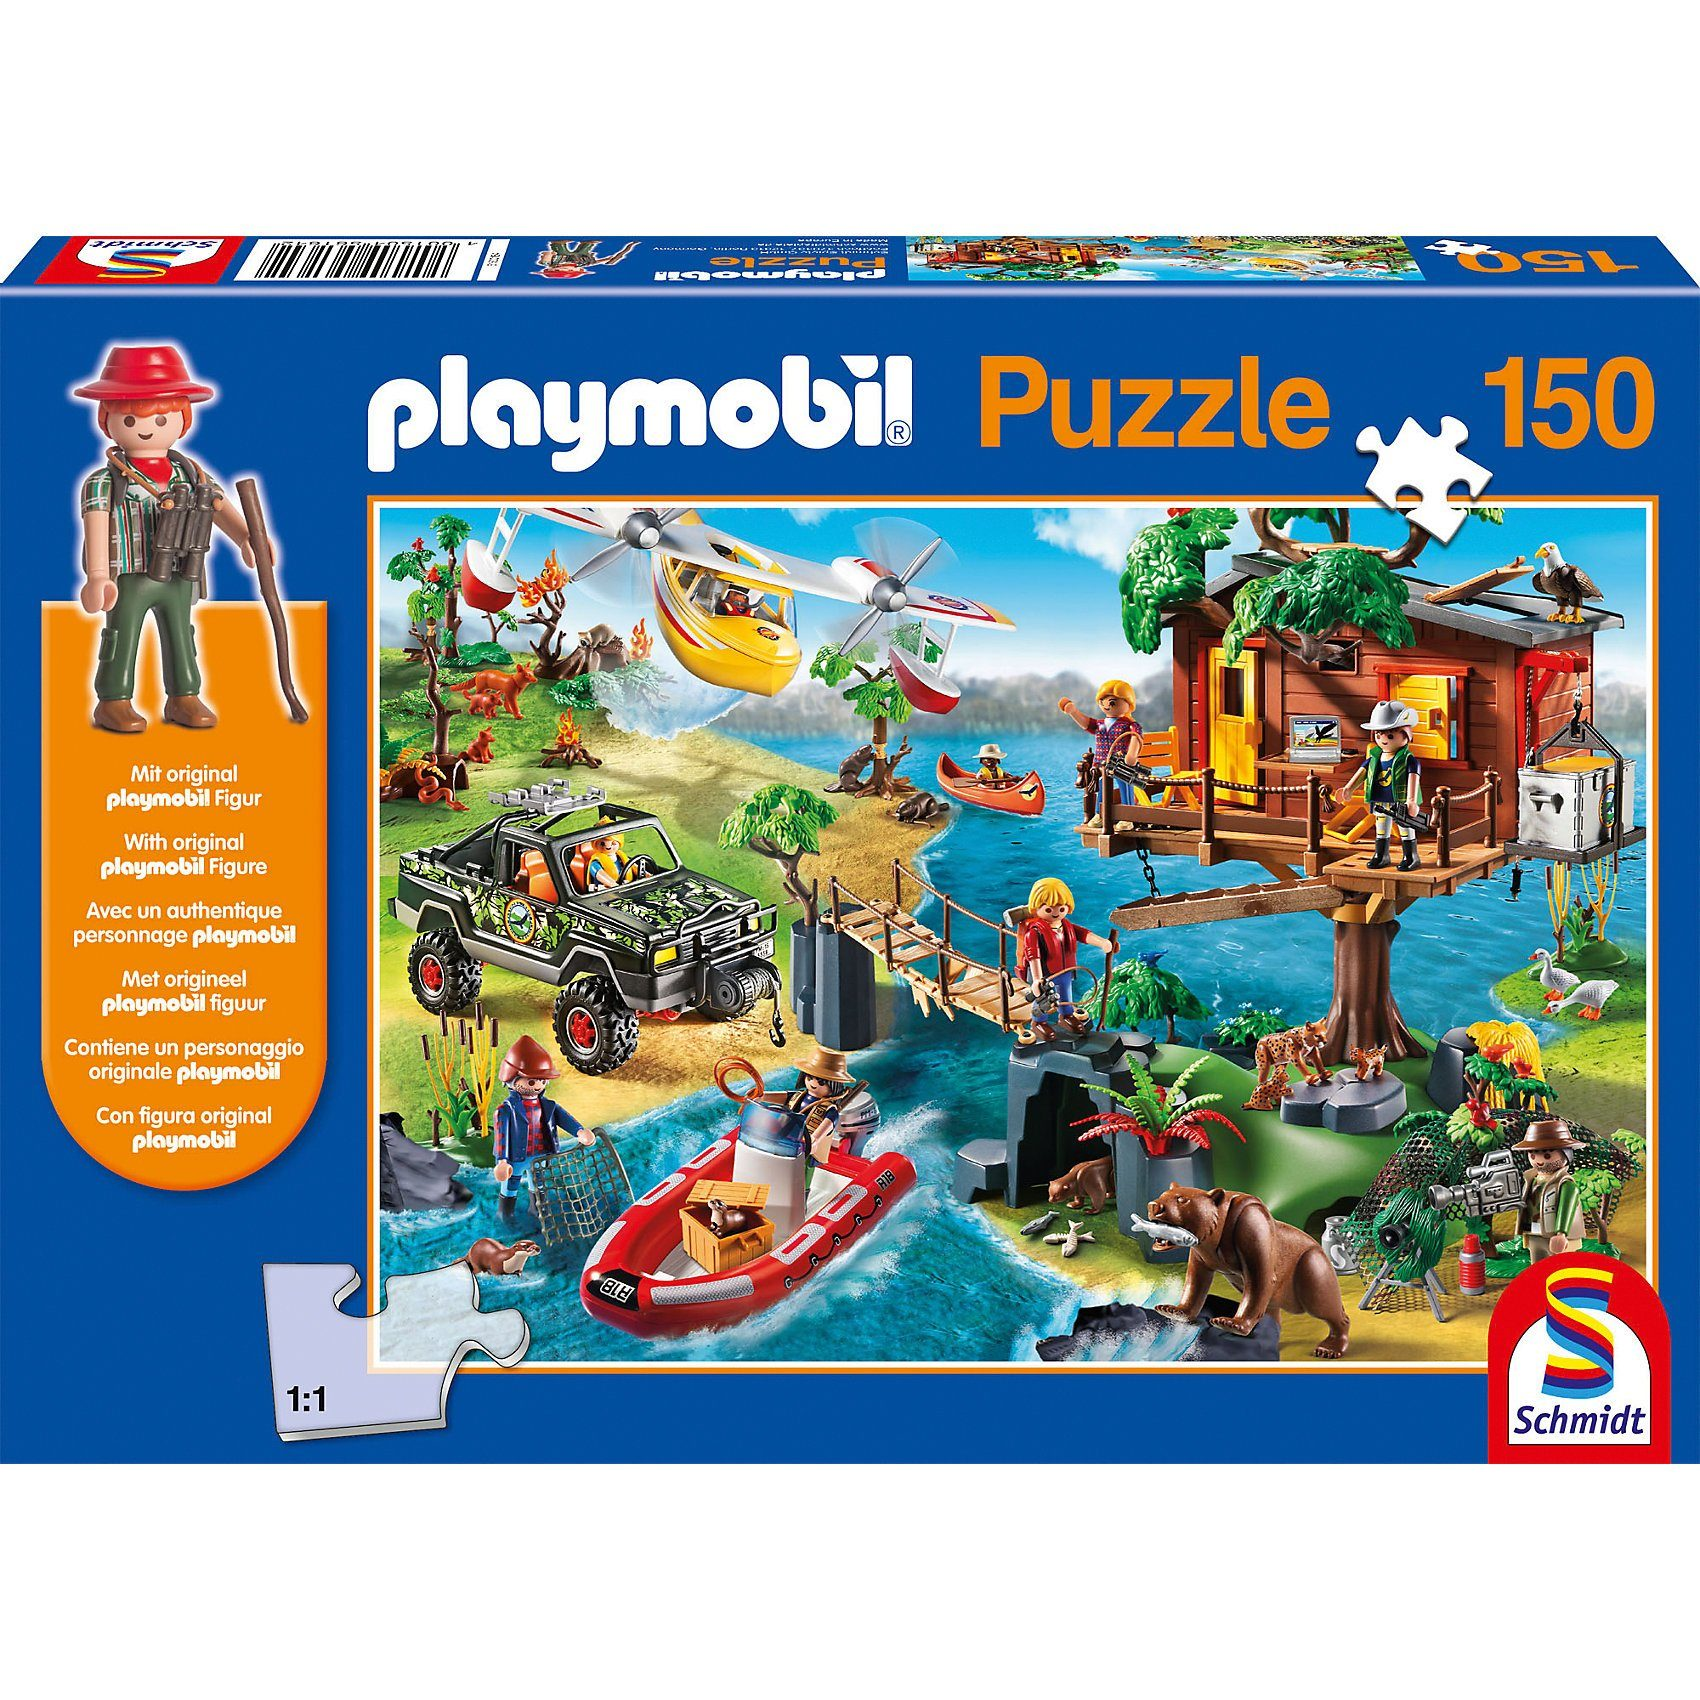 Schmidt Spiele Puzzle Playmobil (inkl. Figur), Baumhaus, 150 Teile